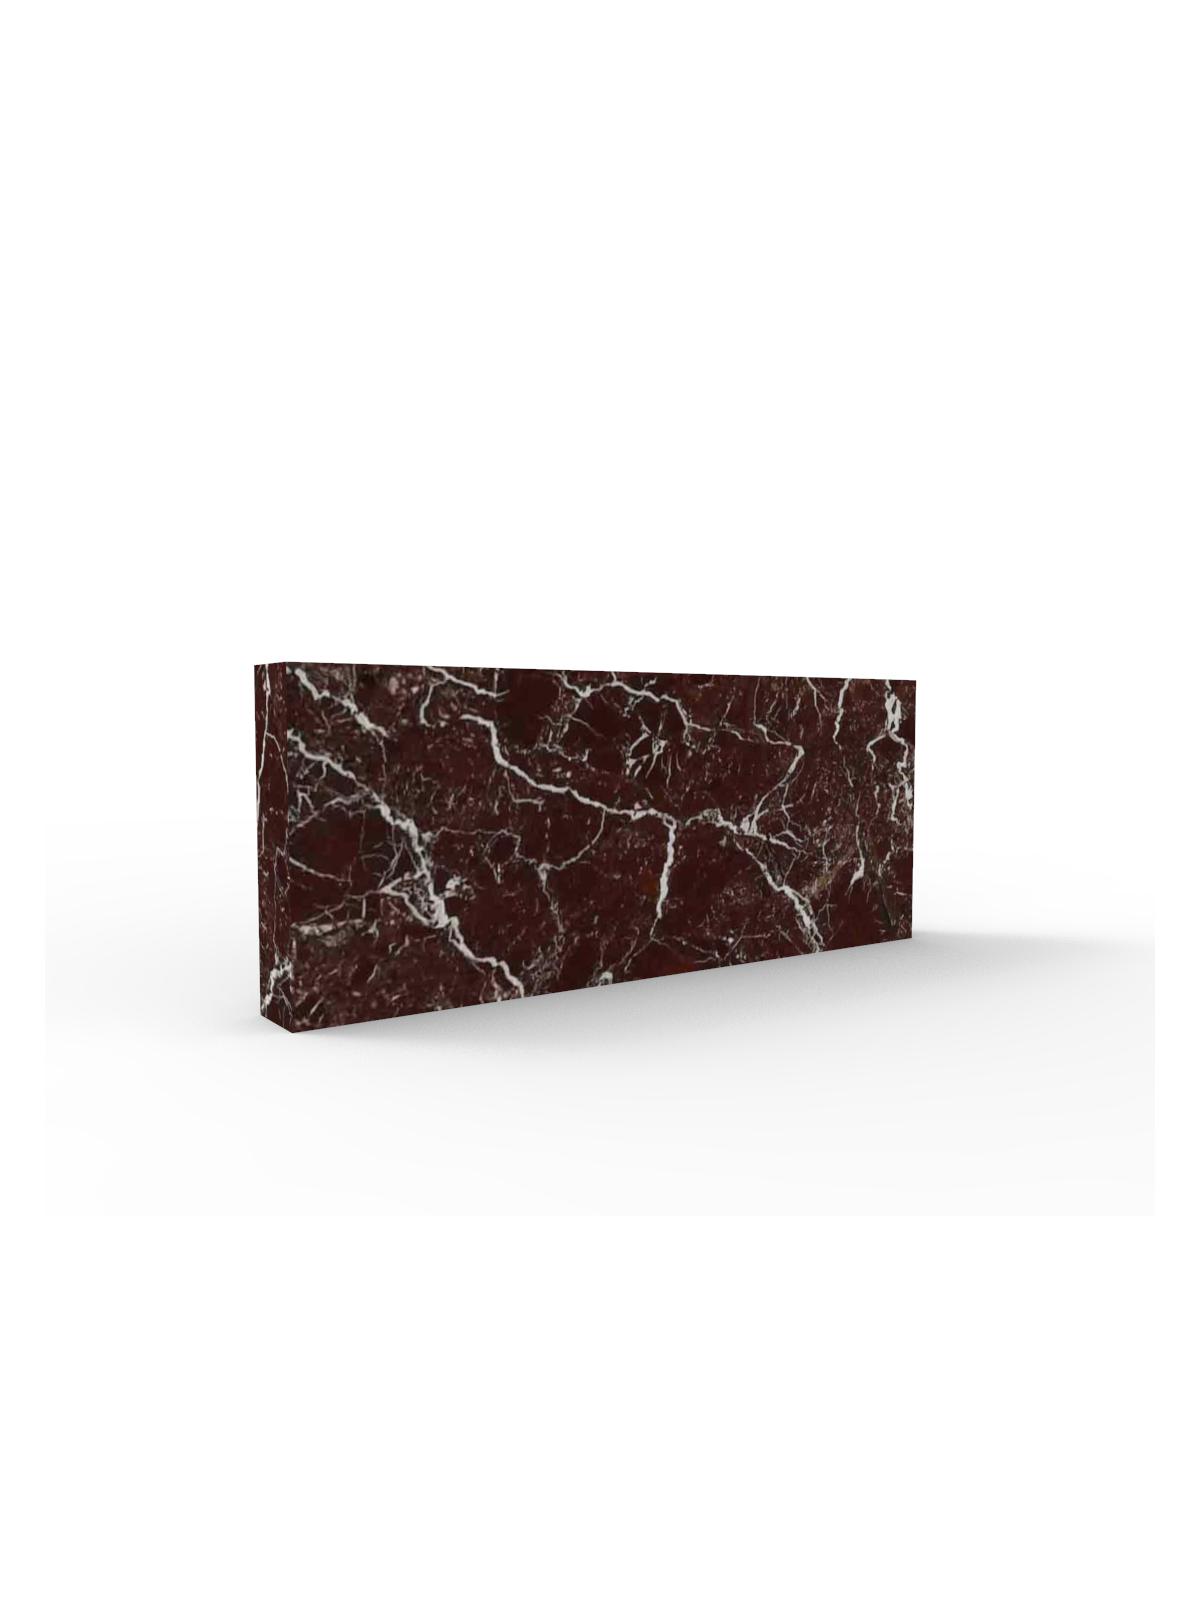 Marmor Sockelleiste I Rosso Levanto